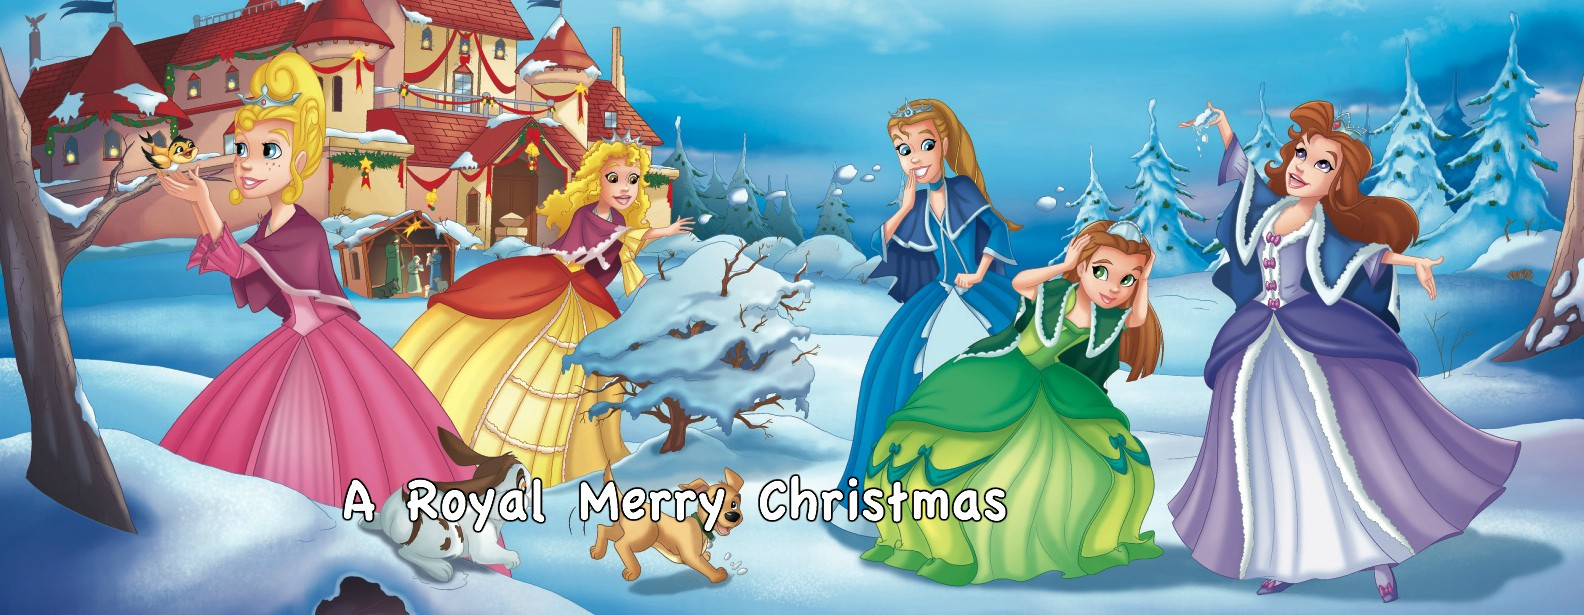 Blog 97 A Royal Merry Christmas.jpg